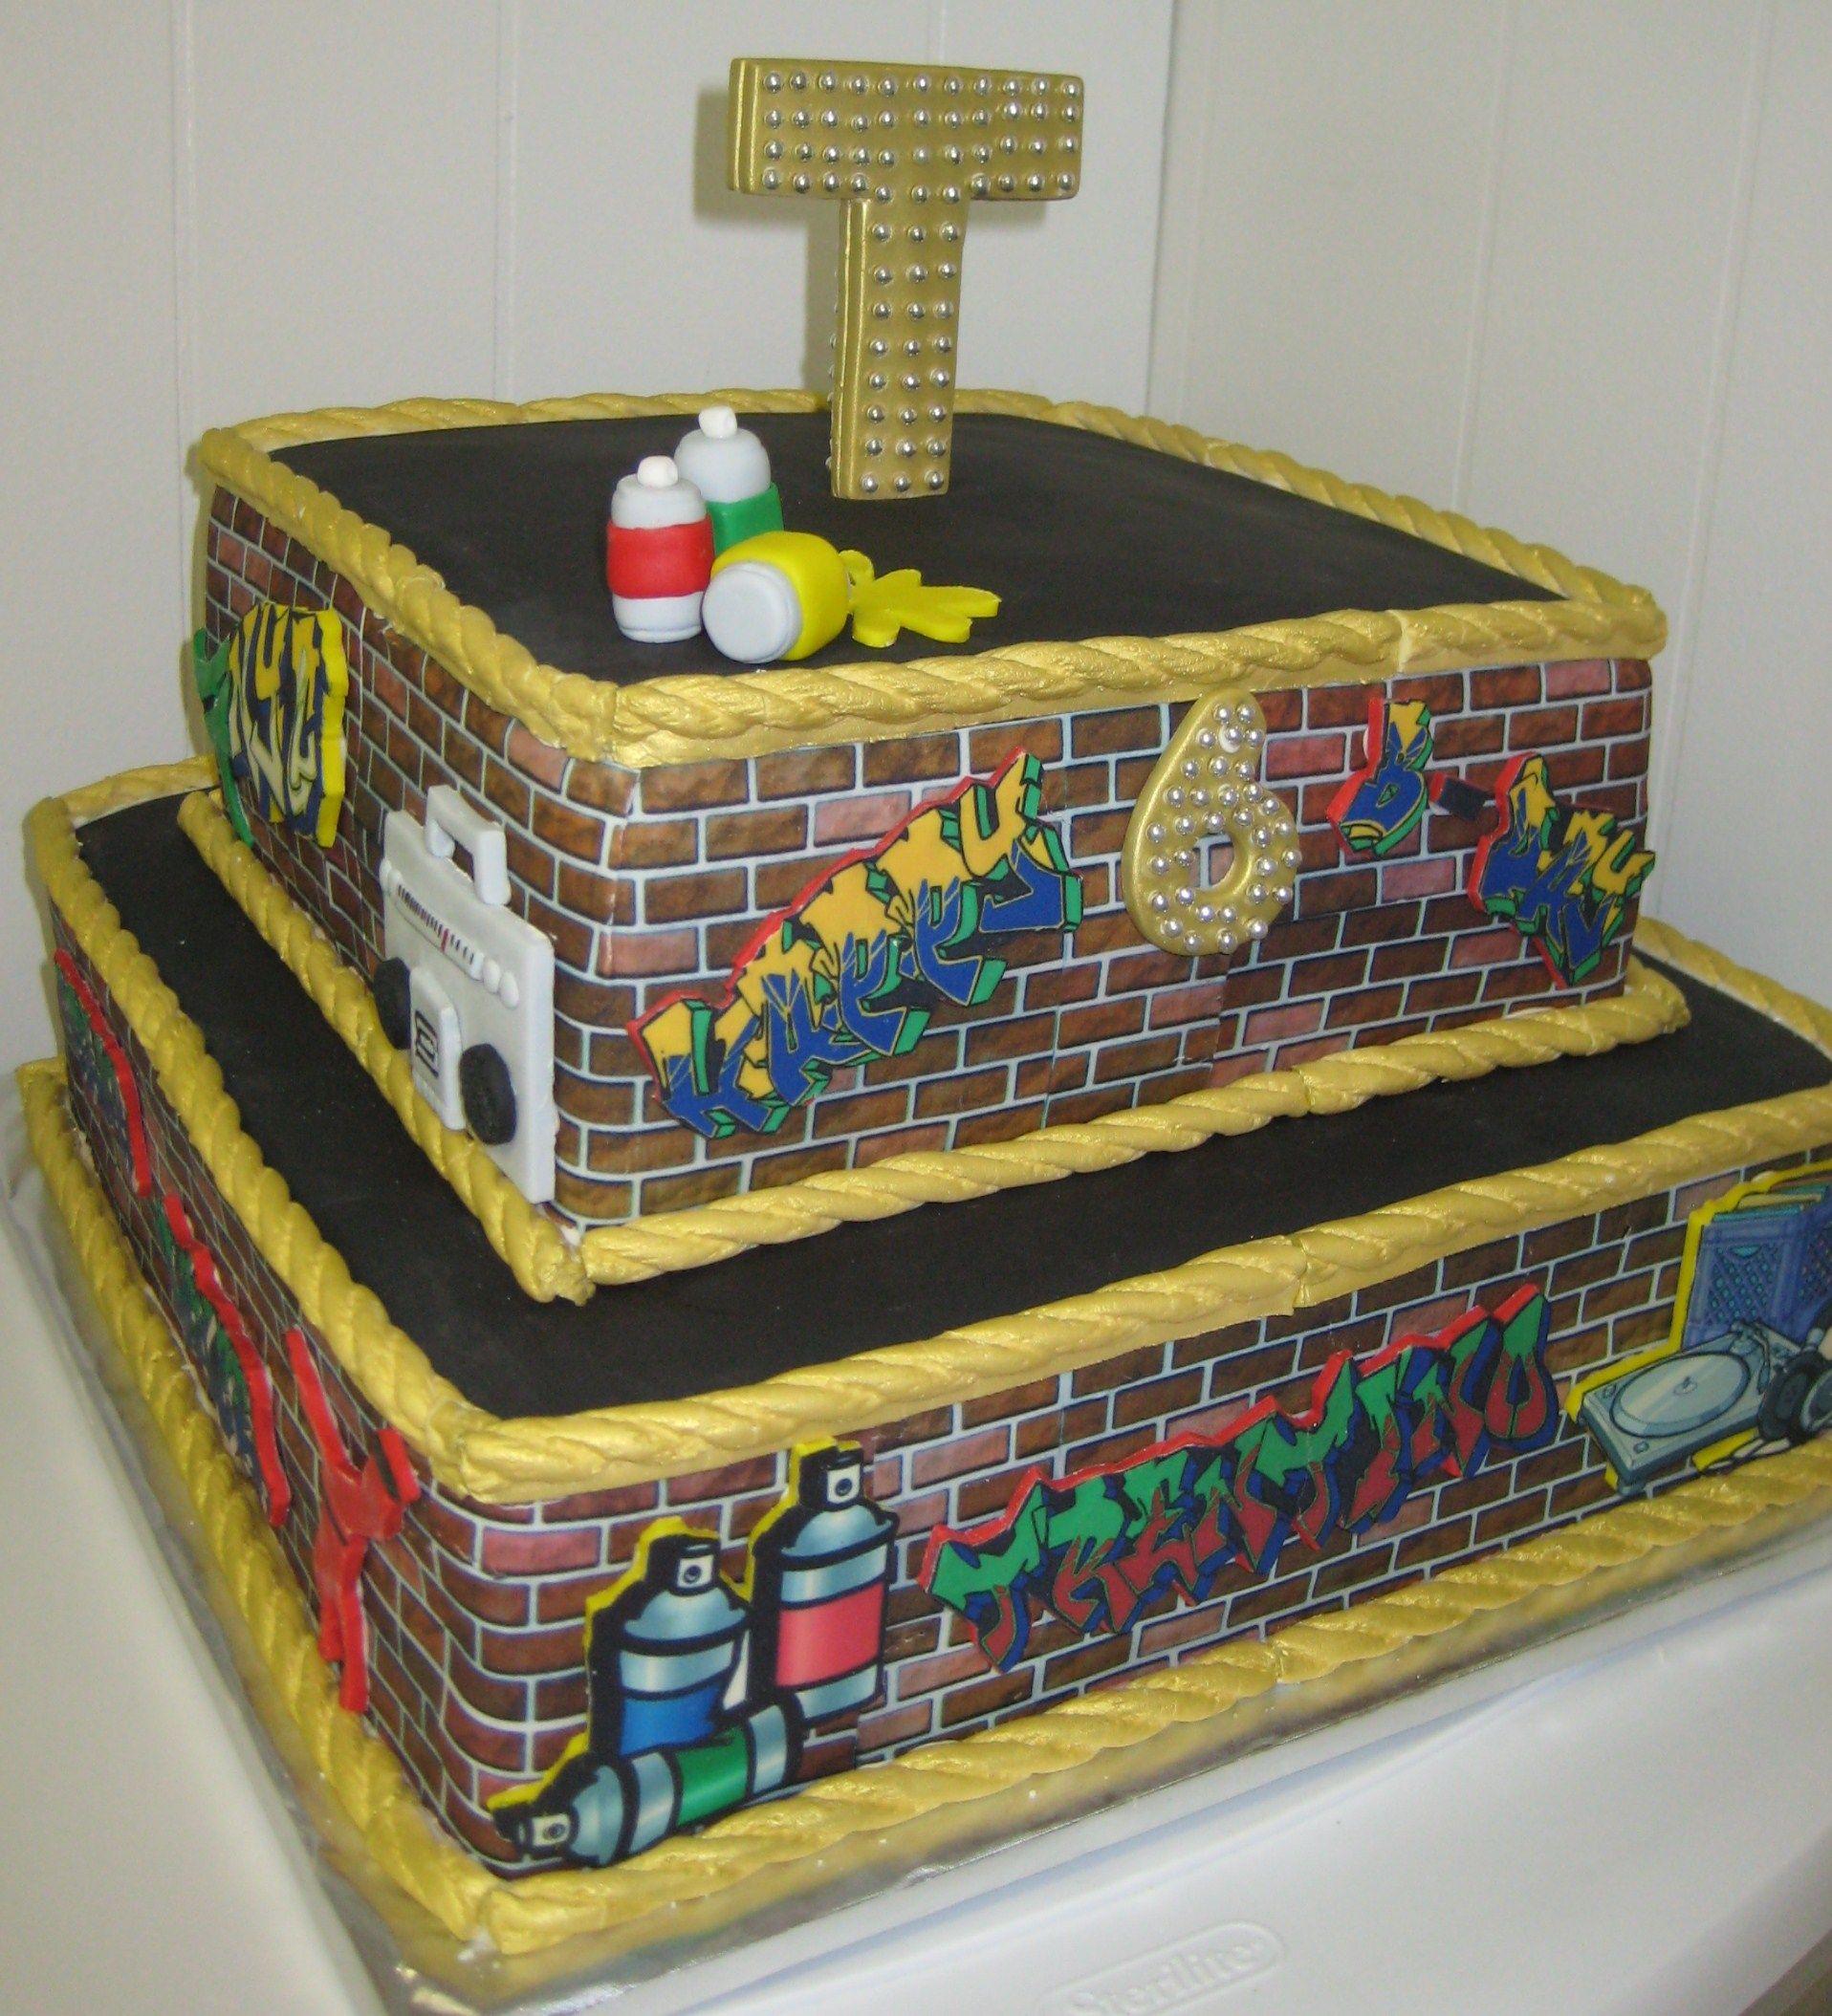 Hip Hop Cake stuff Pinterest Hip hop, Cake and Hip